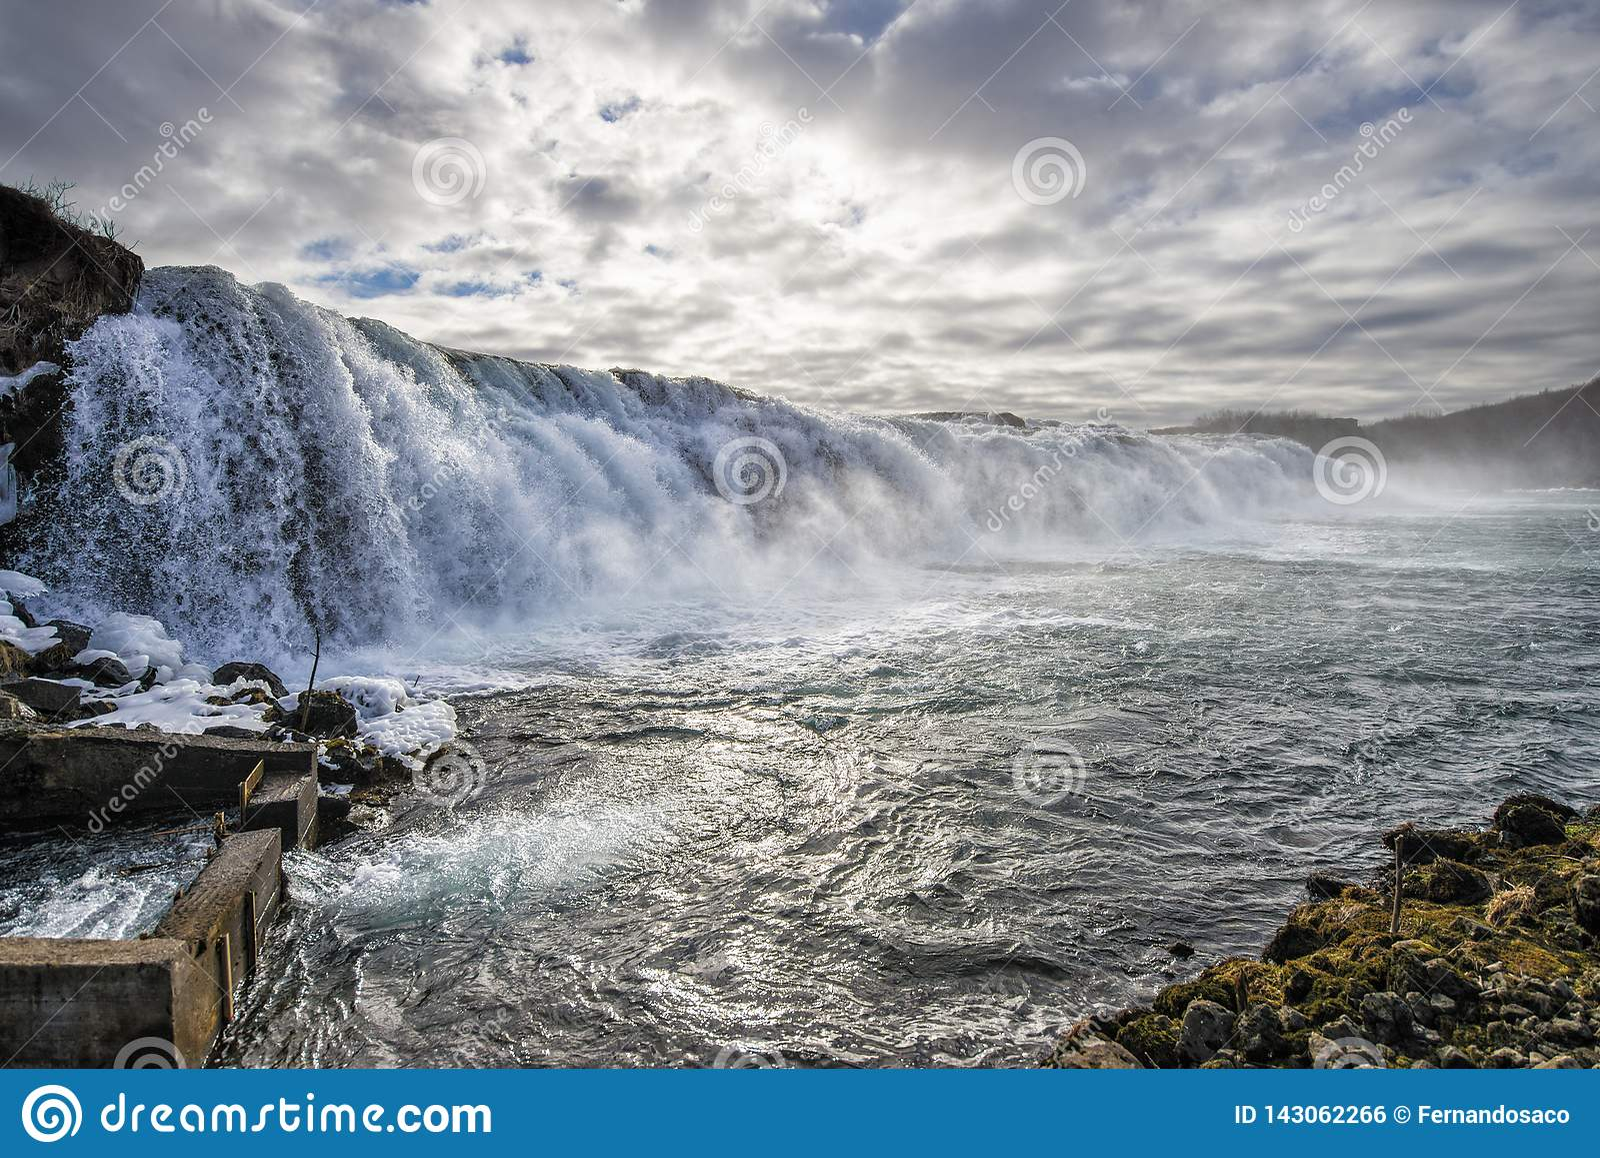 Водопад в семге удя реку